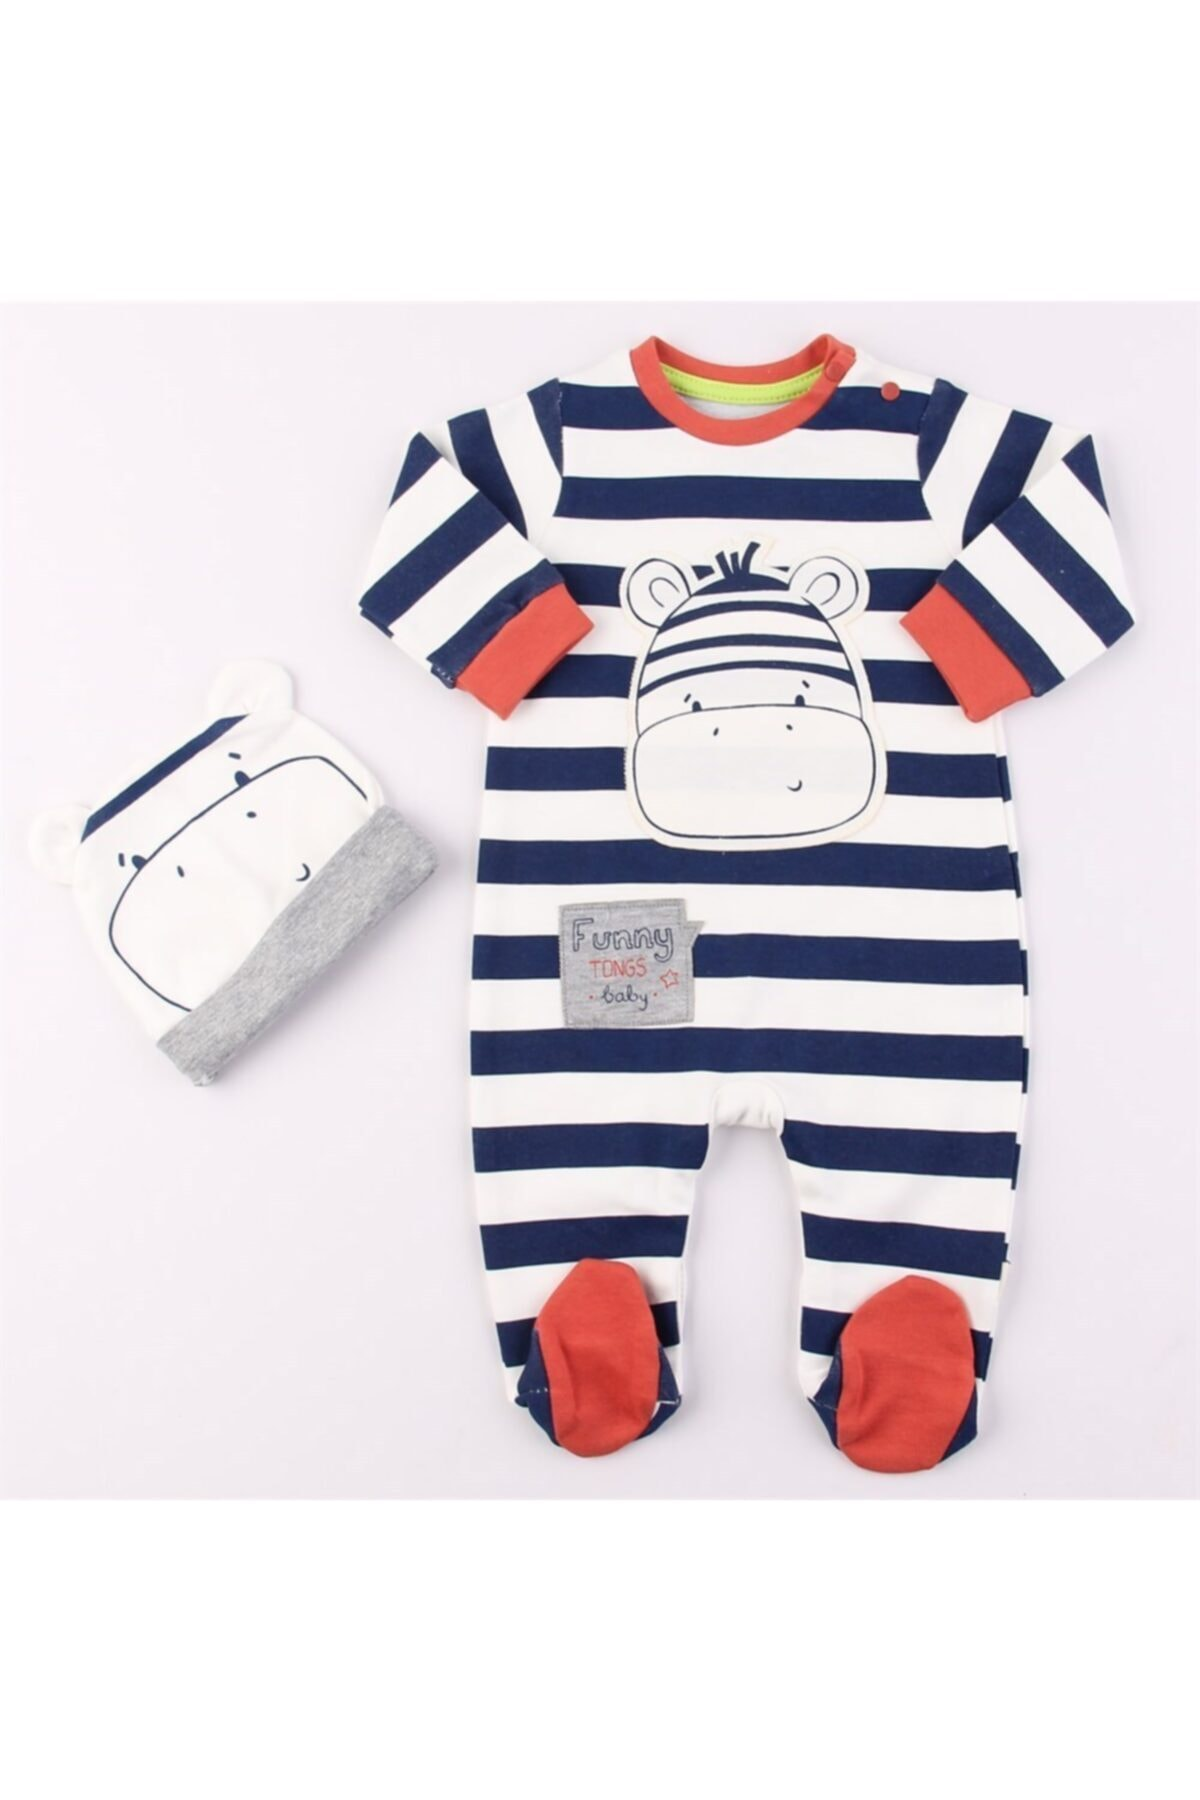 Mini Ropa Kiremit Zebra Çizgili Erkek Bebek Tulum 1